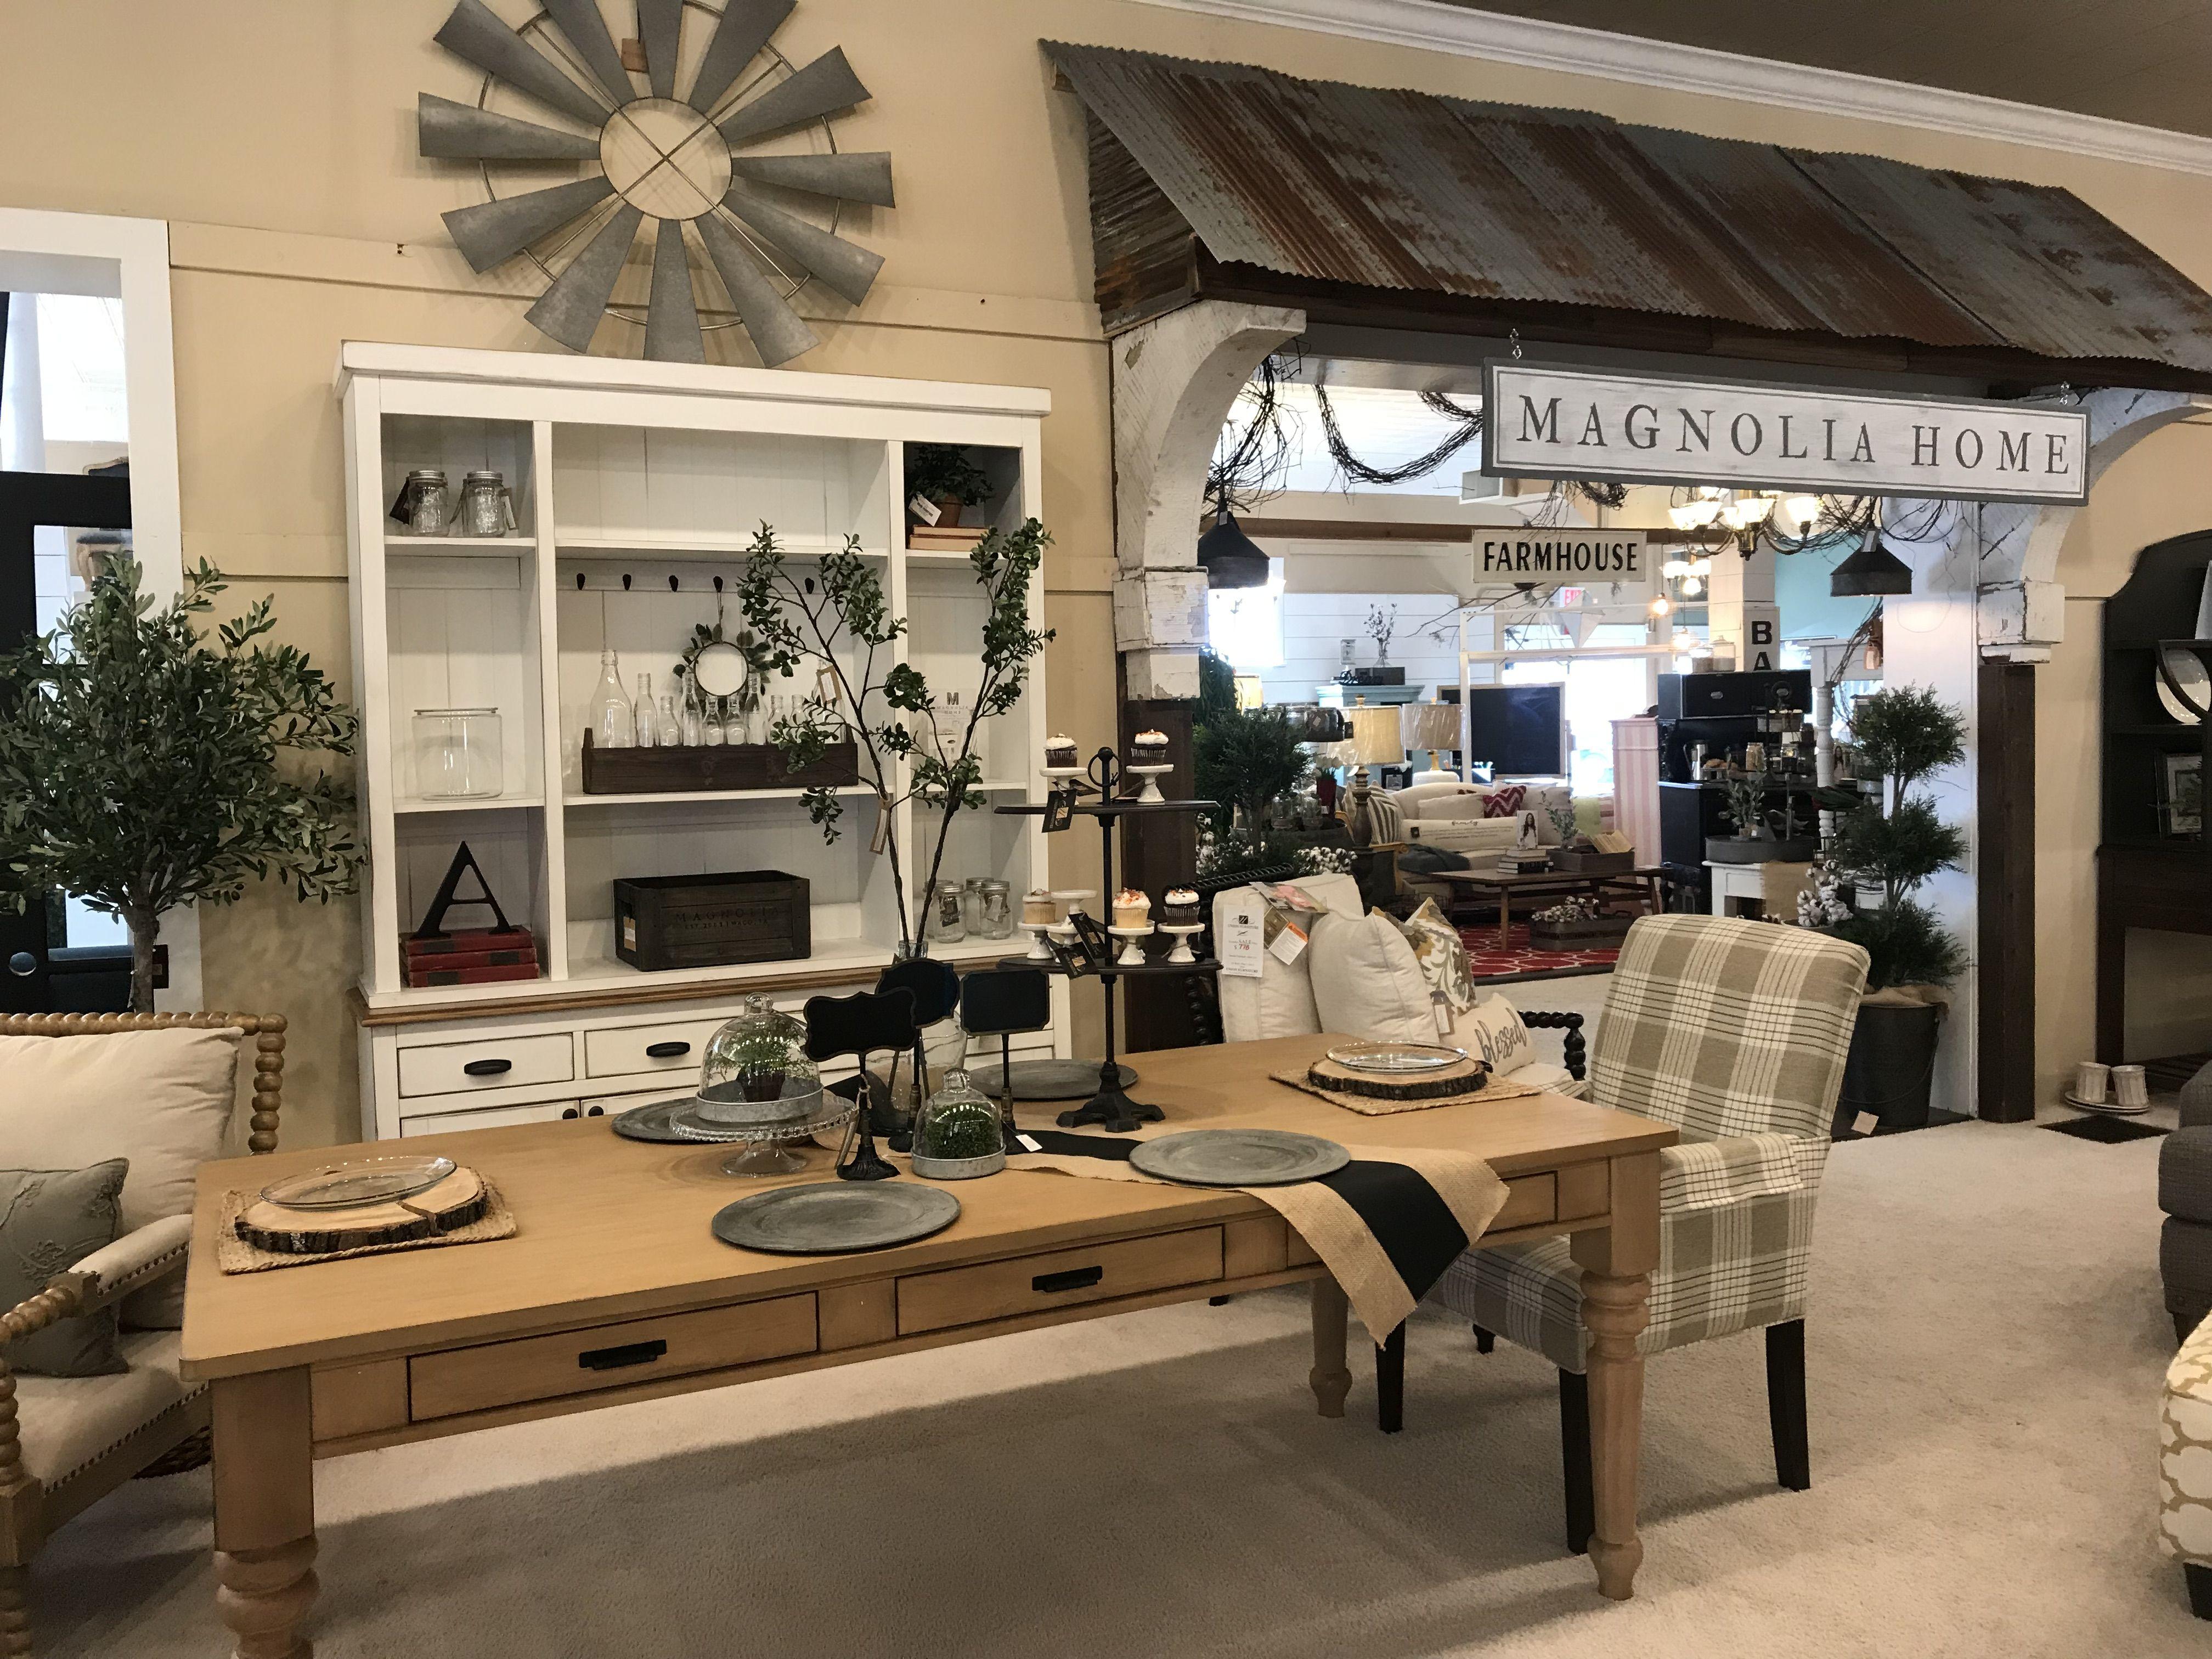 Magnolia Home Table Magnolia Homes Home Flooring Store